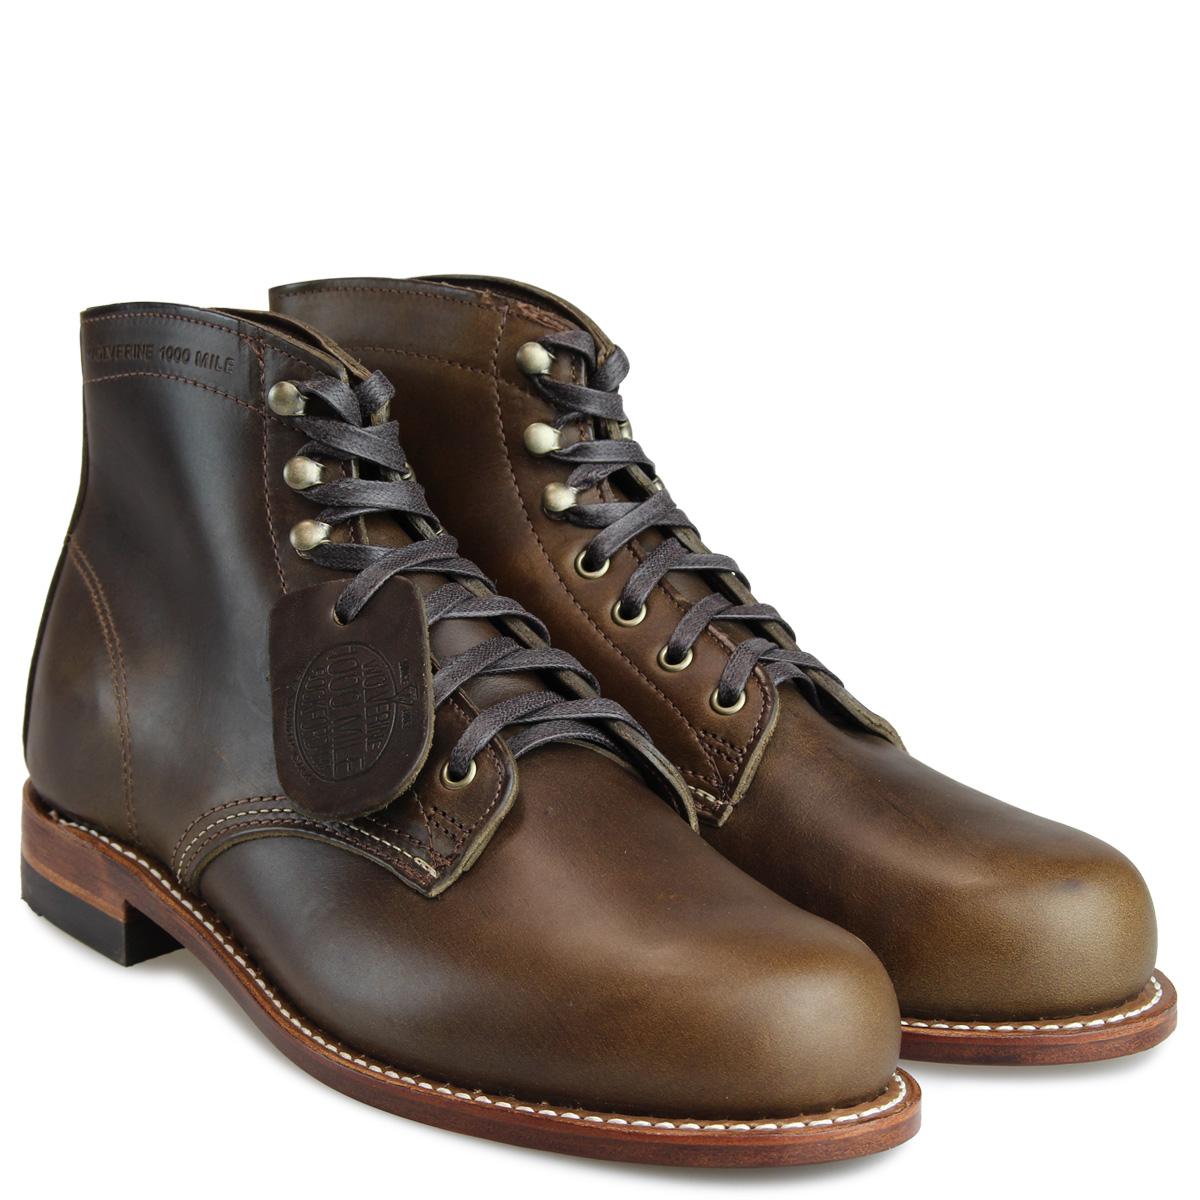 cca41a357eb WOLVERINE ORIGINAL 1000 MILE BOOT ウルヴァリンブーツメンズ D Wise W40387 dark olive  work boots [11/2 Shinnyu load]